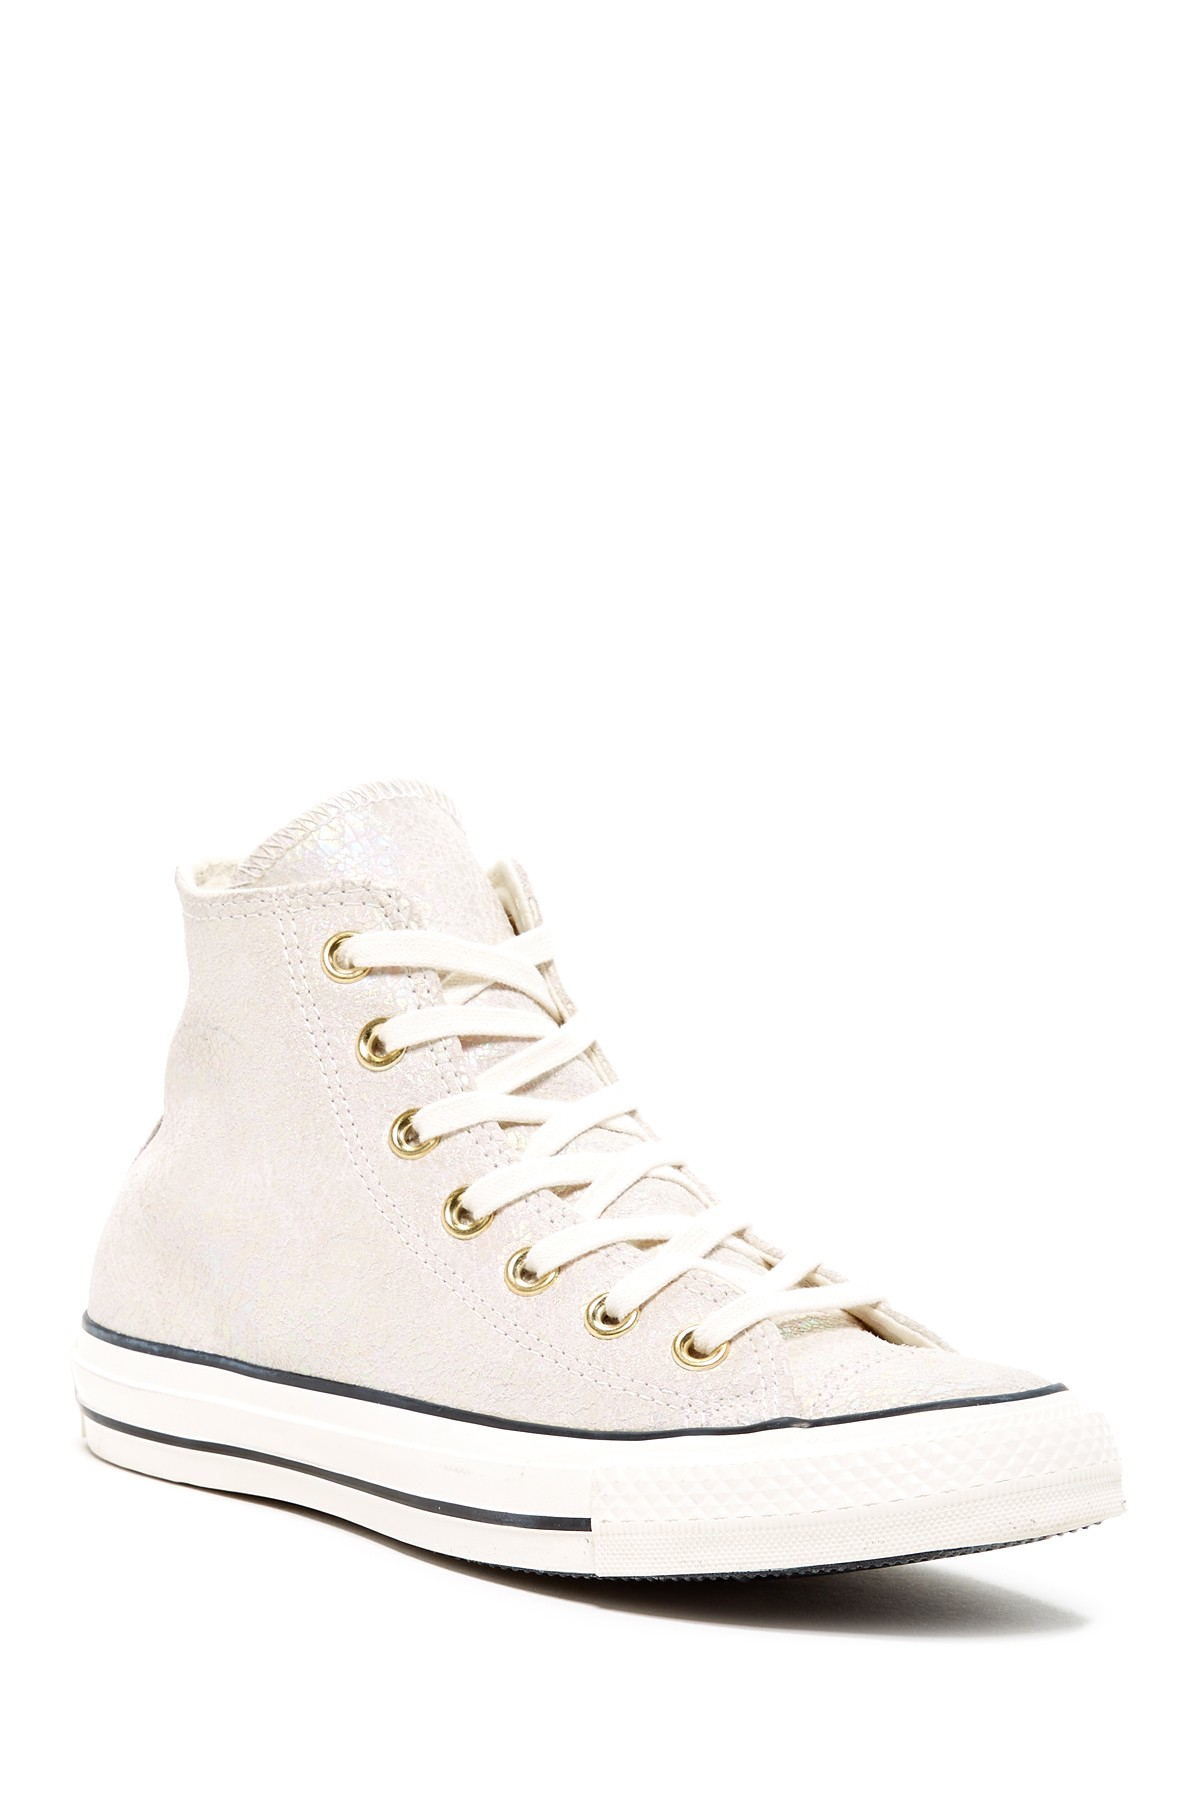 Converse Chuck Taylor(r) All Star(r) High Top Sneaker ...